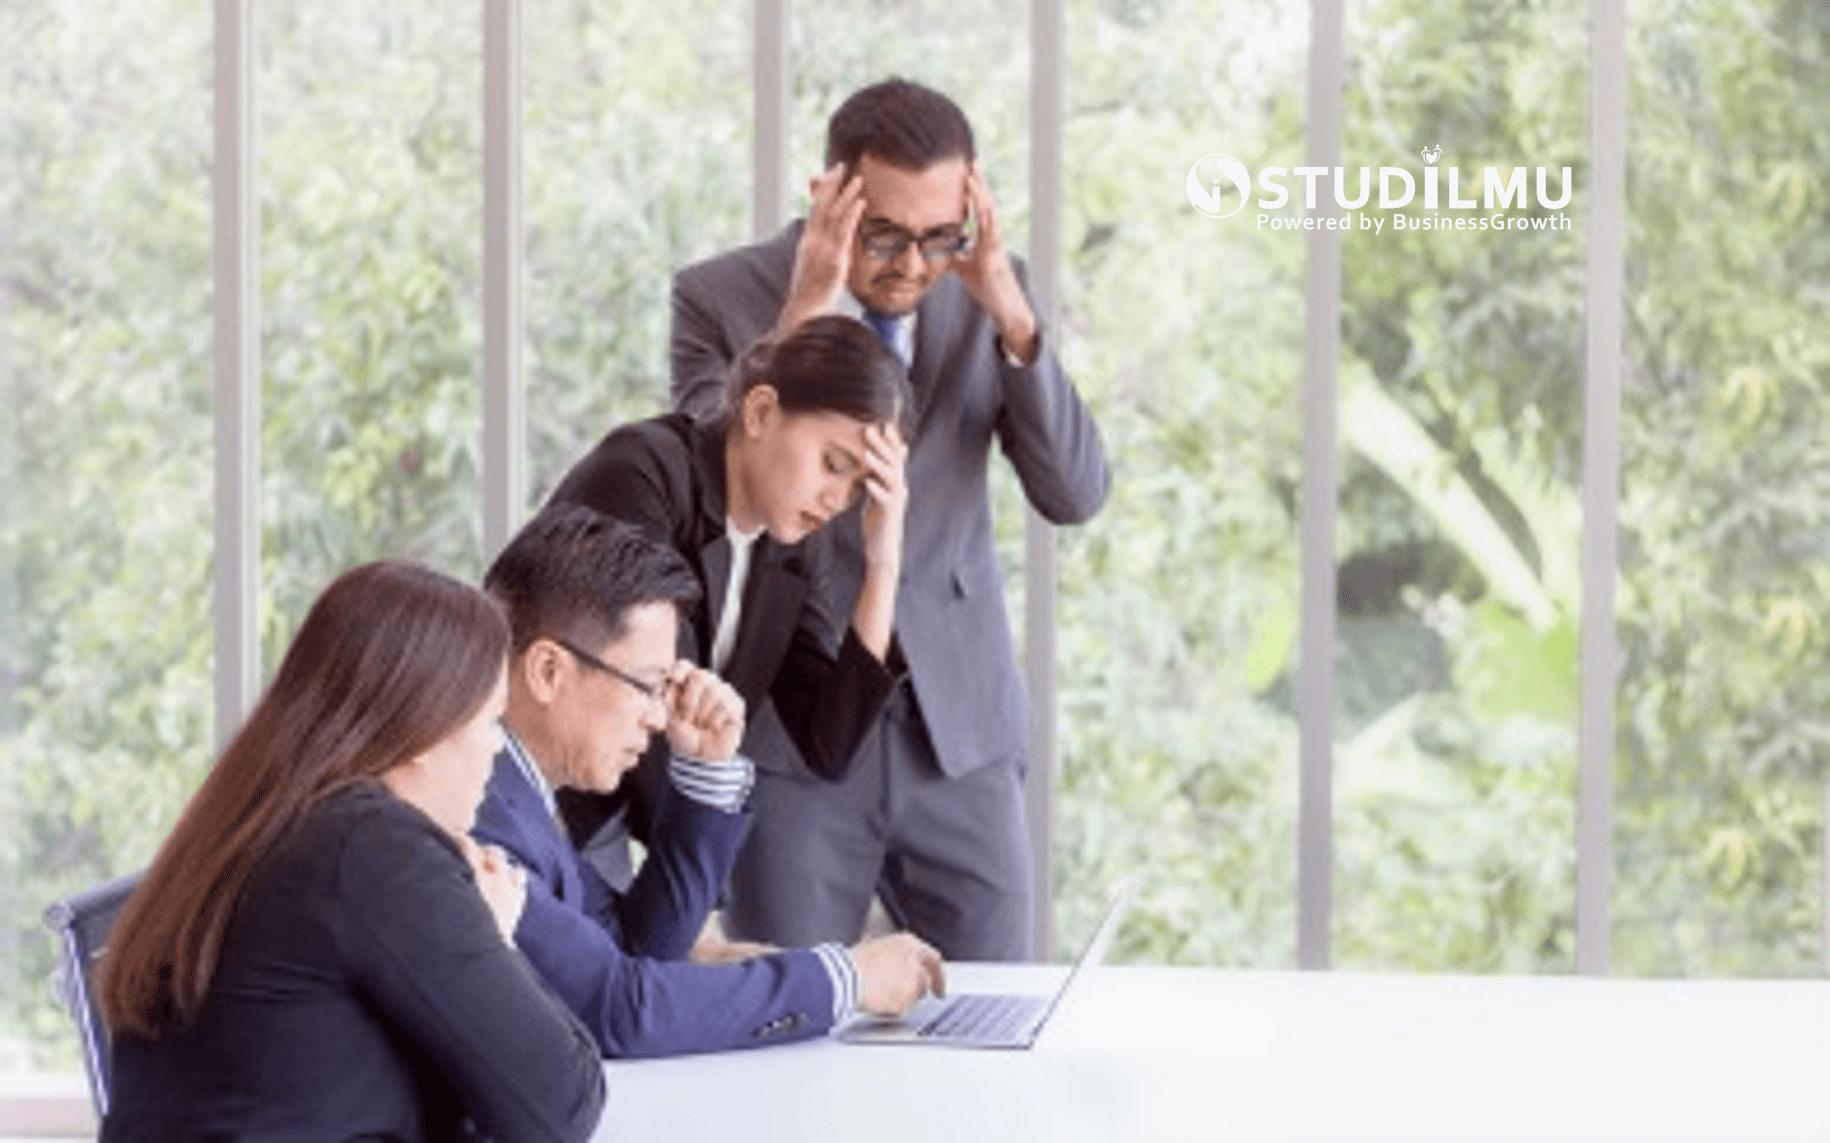 STUDILMU Career Advice - 10 Pertanyaan Cara Berpikir Kritis